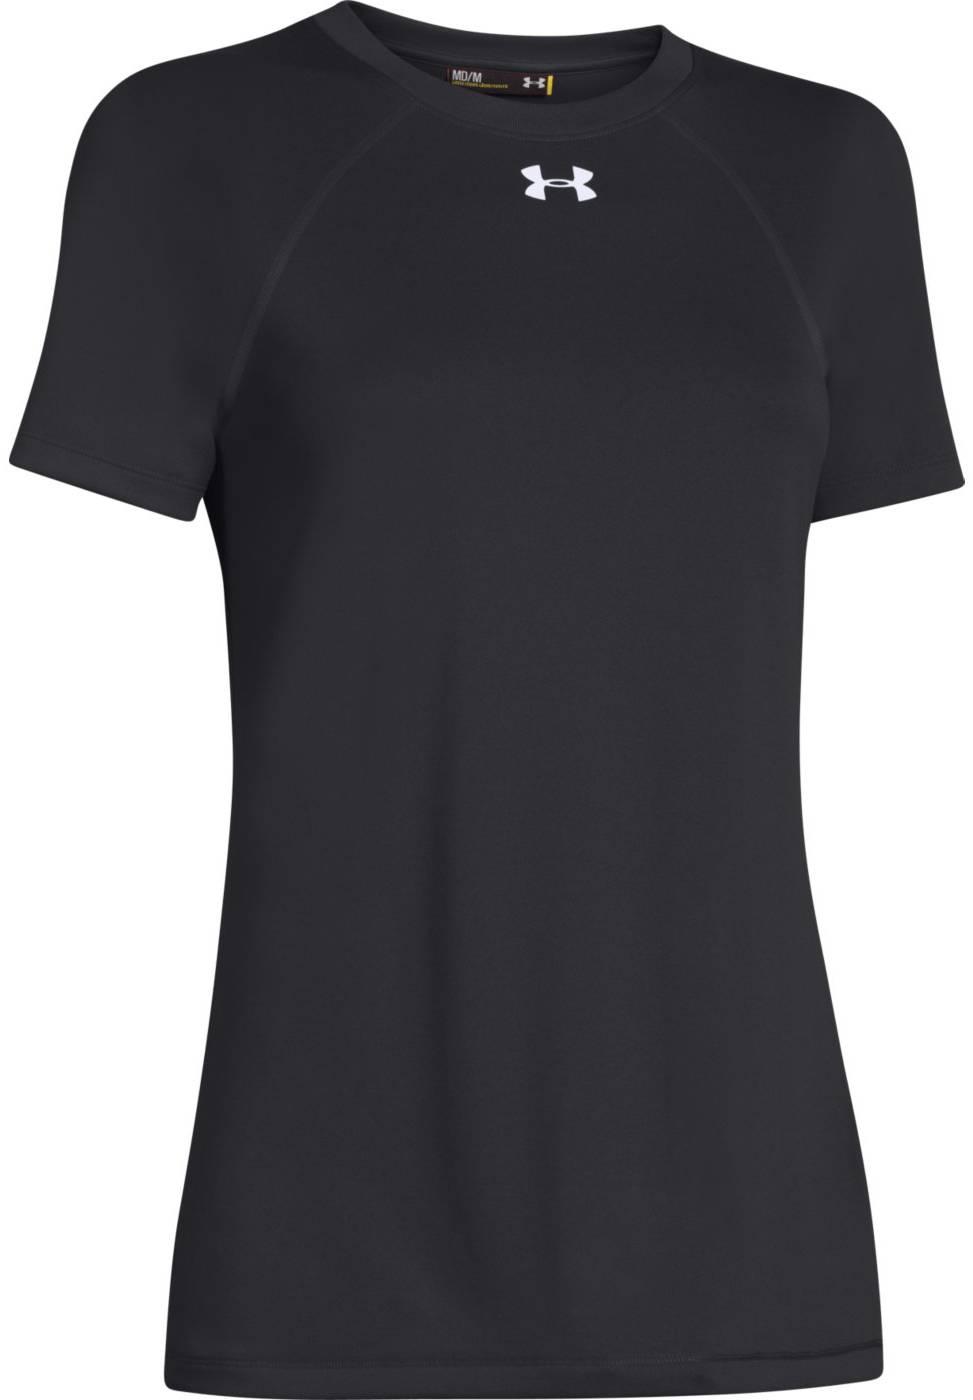 Under armour women 39 s locker t shirt for Customized under armour shirts